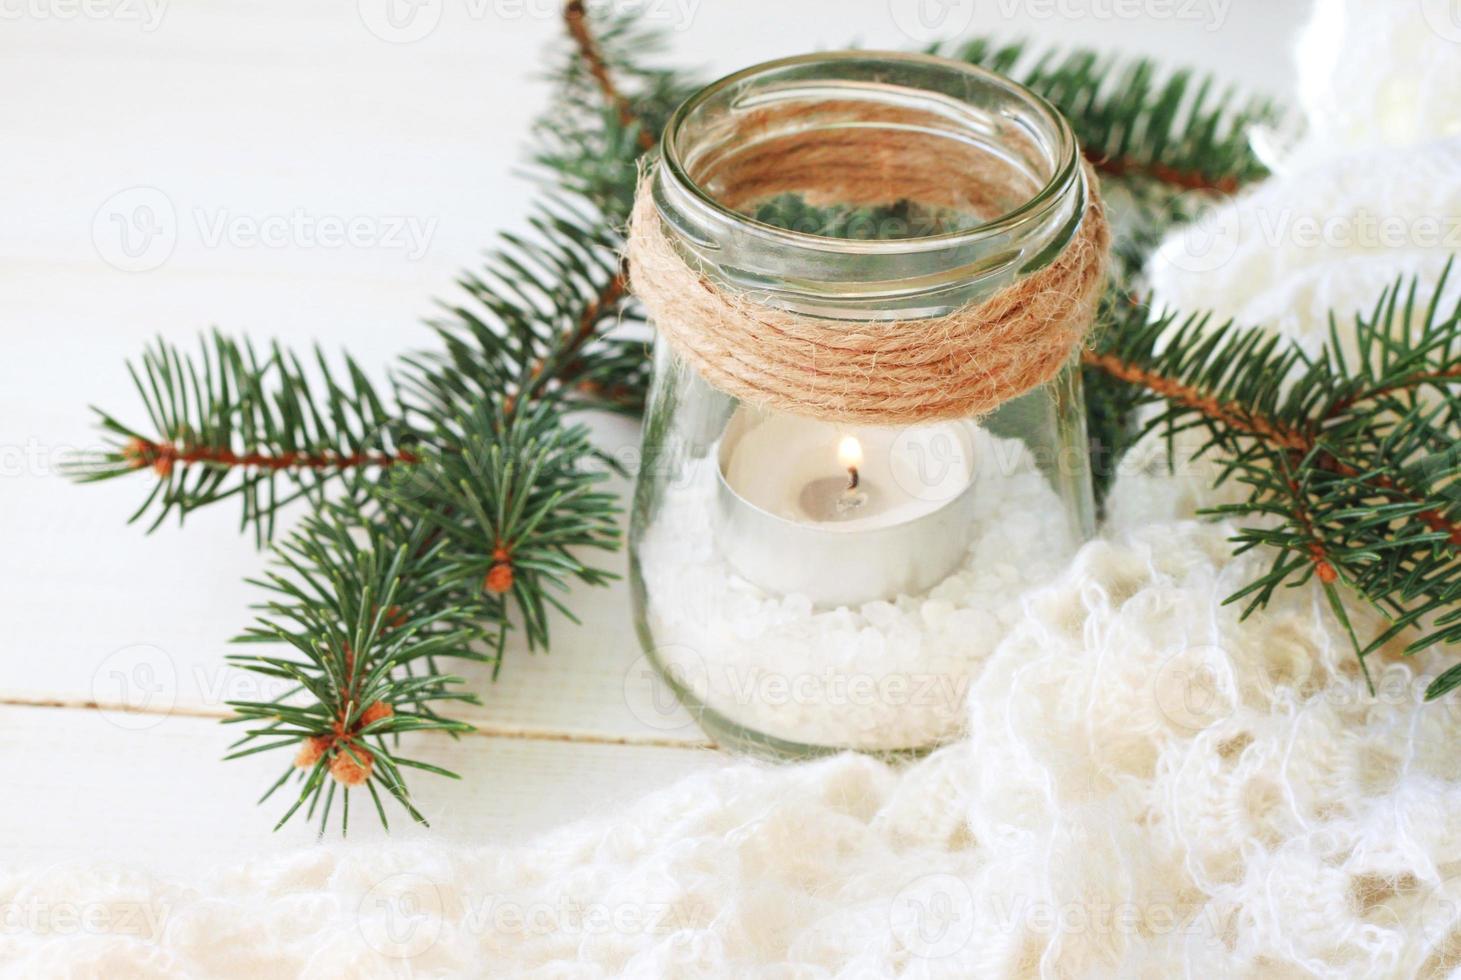 Kerzenhalter im Winterstil foto